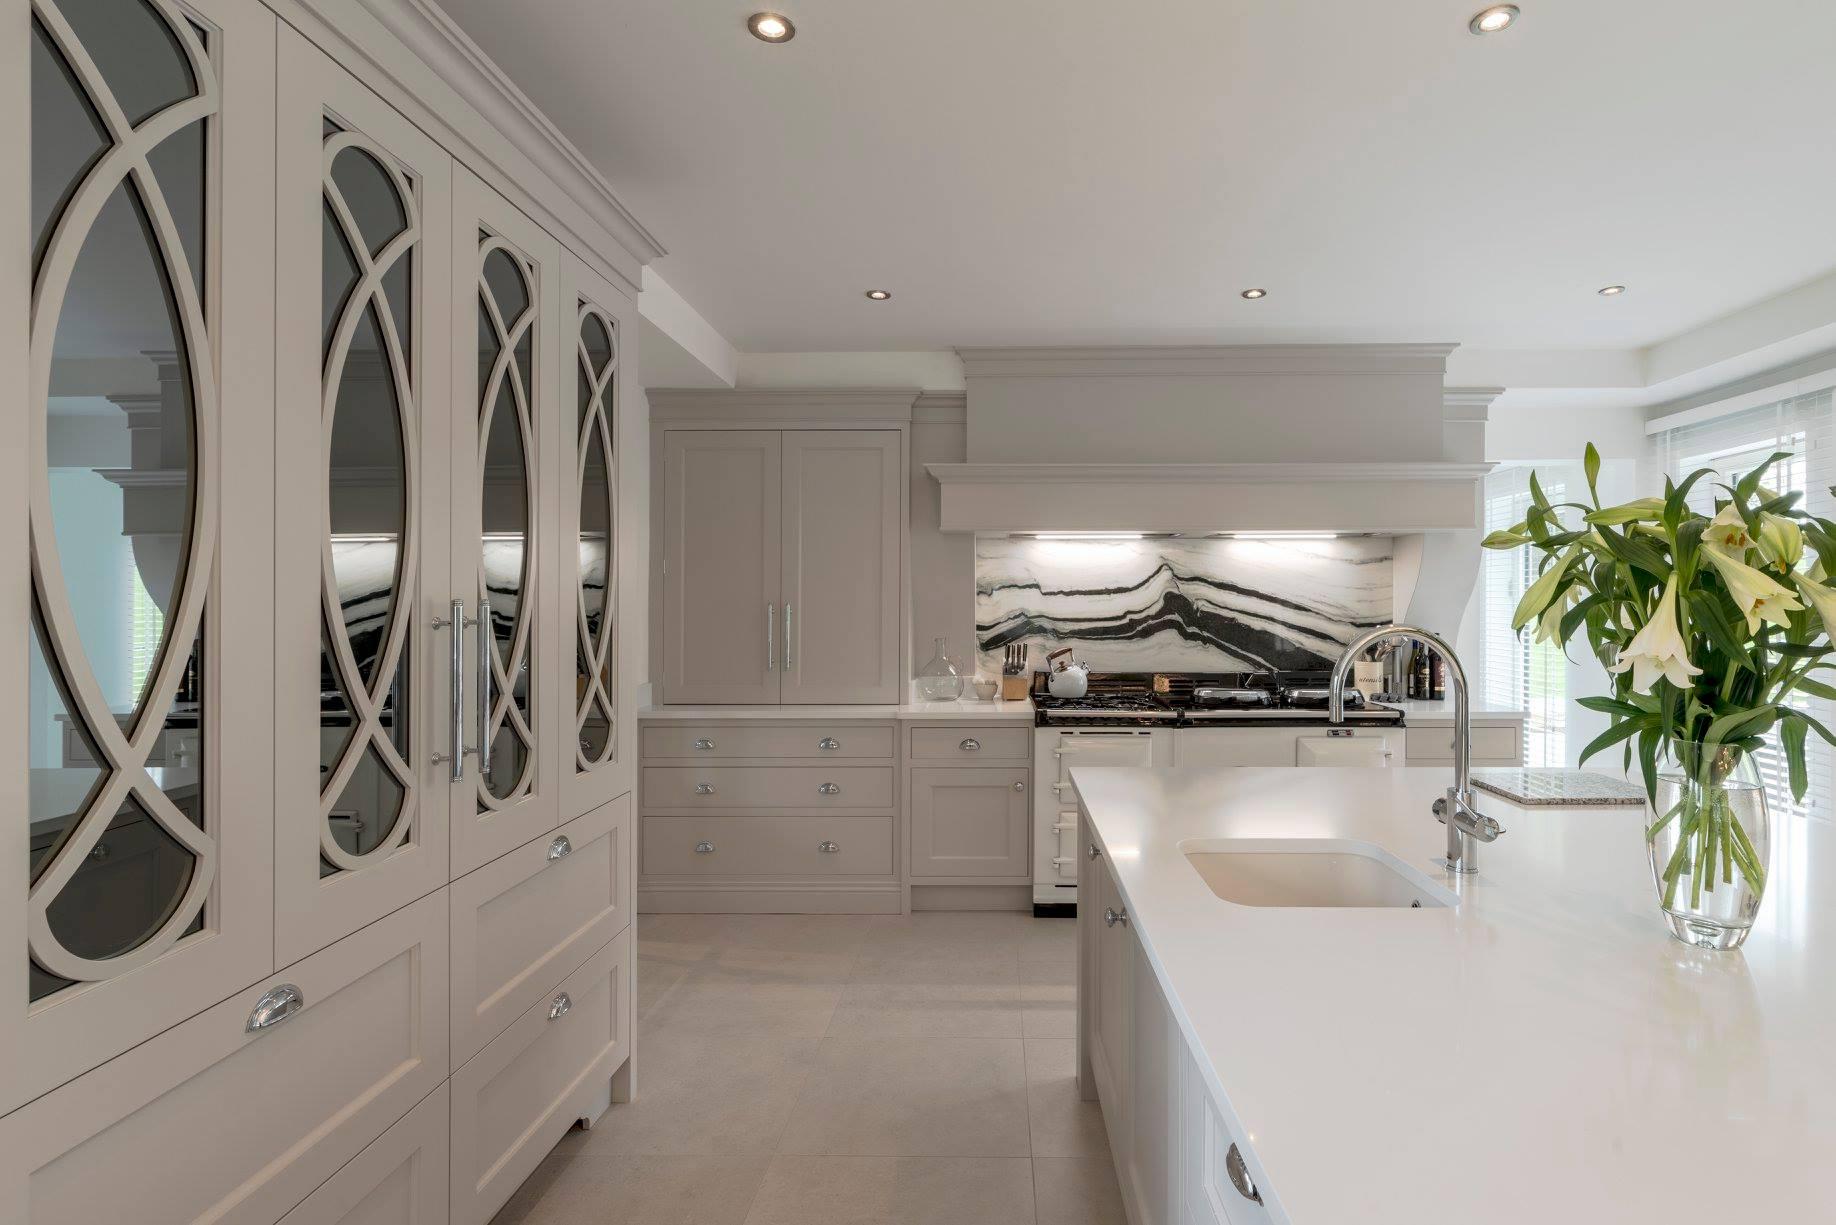 Luxury Bespoke Kitchens Furniture Cheshire Handmade For You